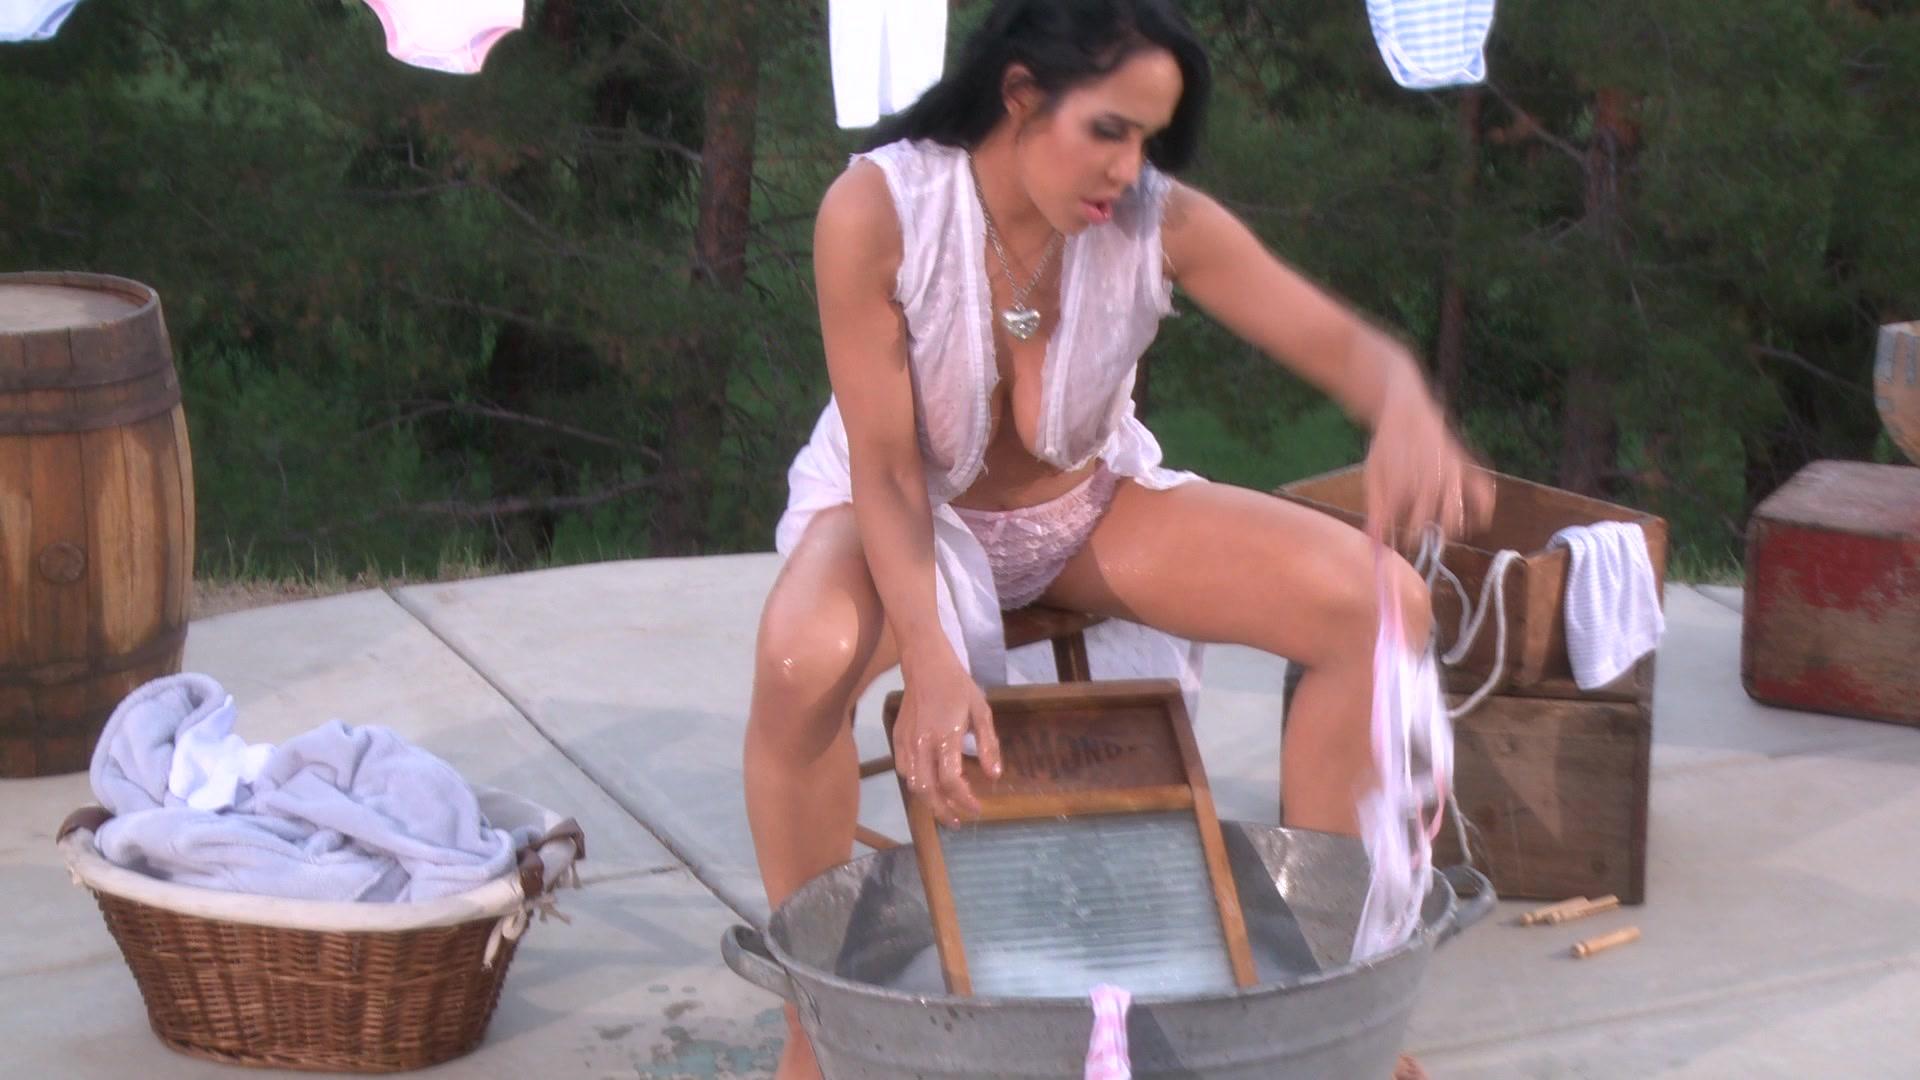 OctoMom porno Latina tyttö ruiskuttaminen